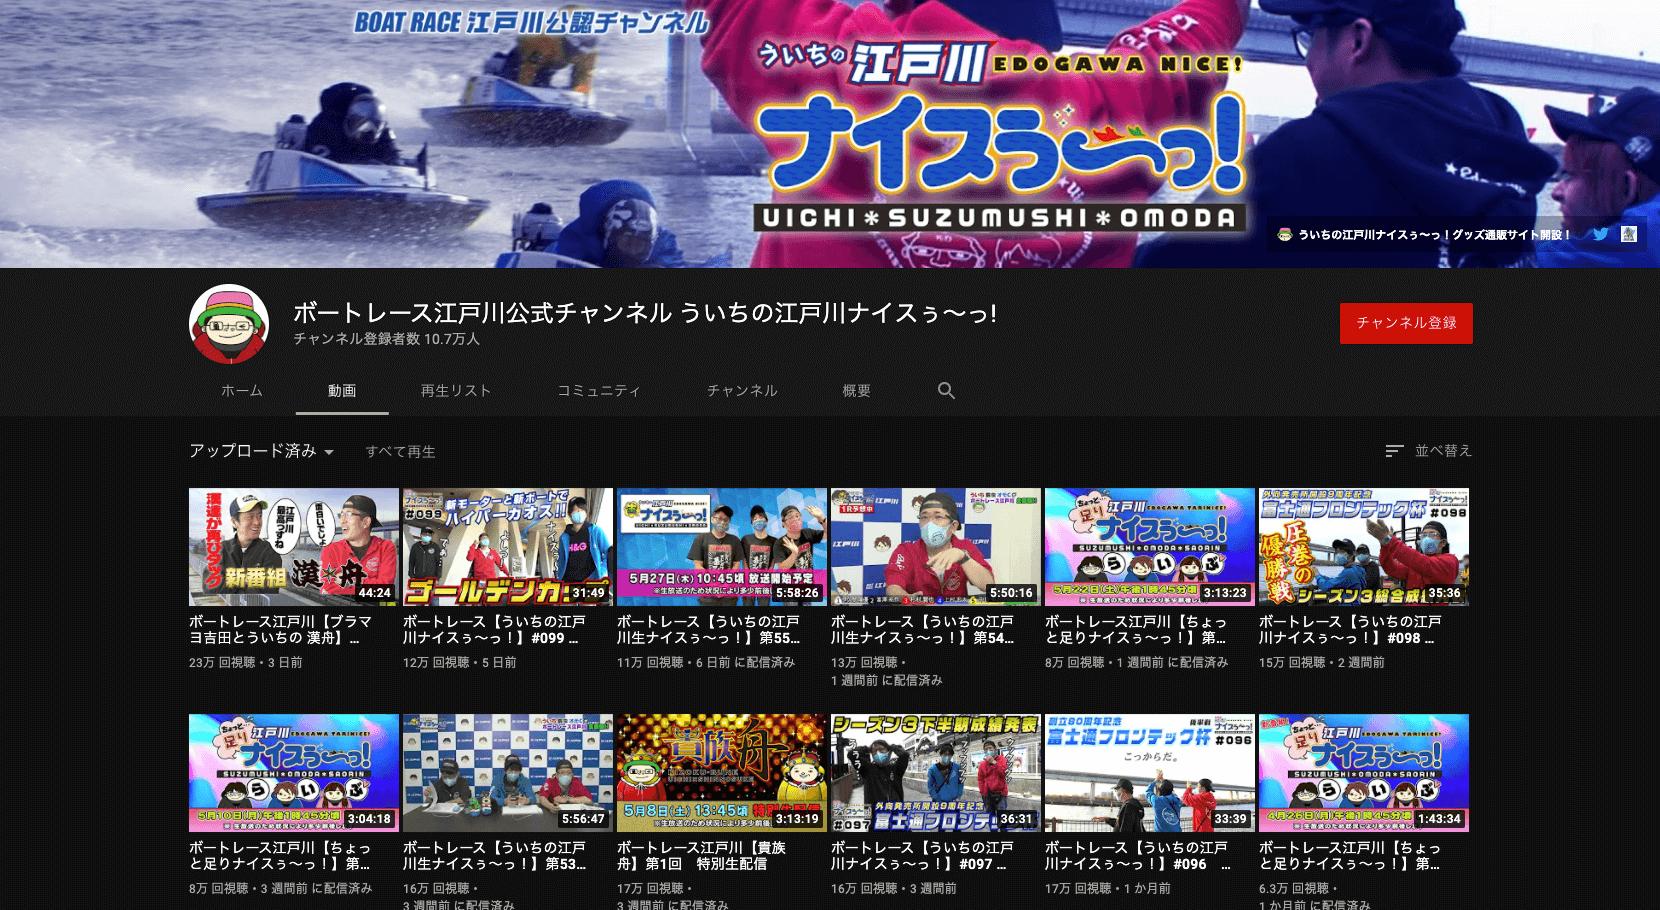 youtube_boatrace_edogawa